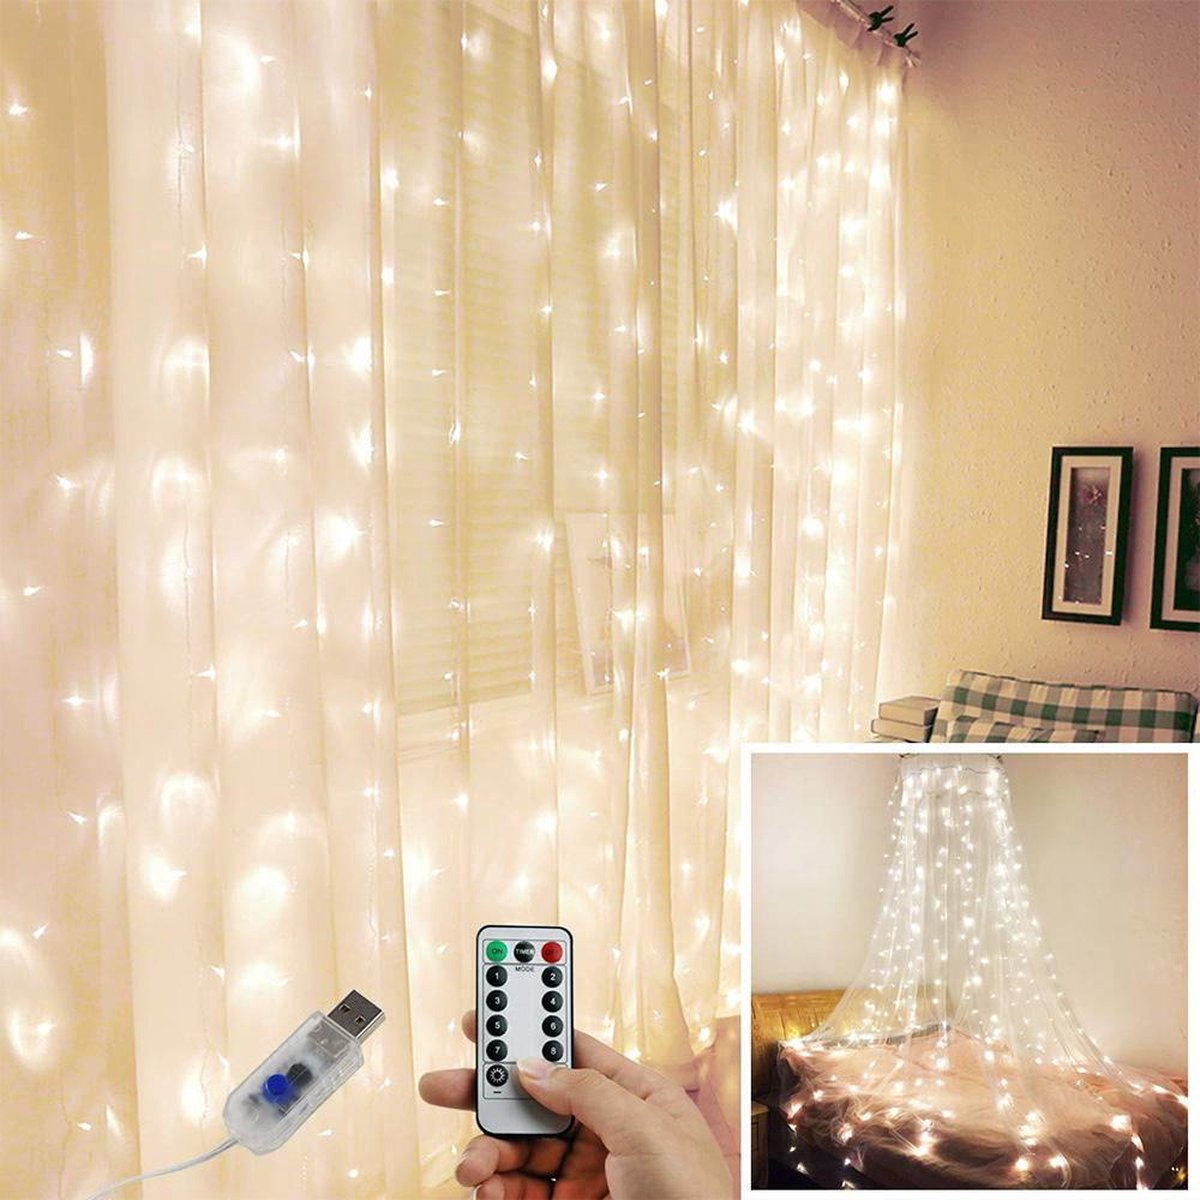 LED Kerstverlichting Lichtgordijn - 3 meter - Warm wit - 300 lichten  - Kerstverlichting  - Kerstdec